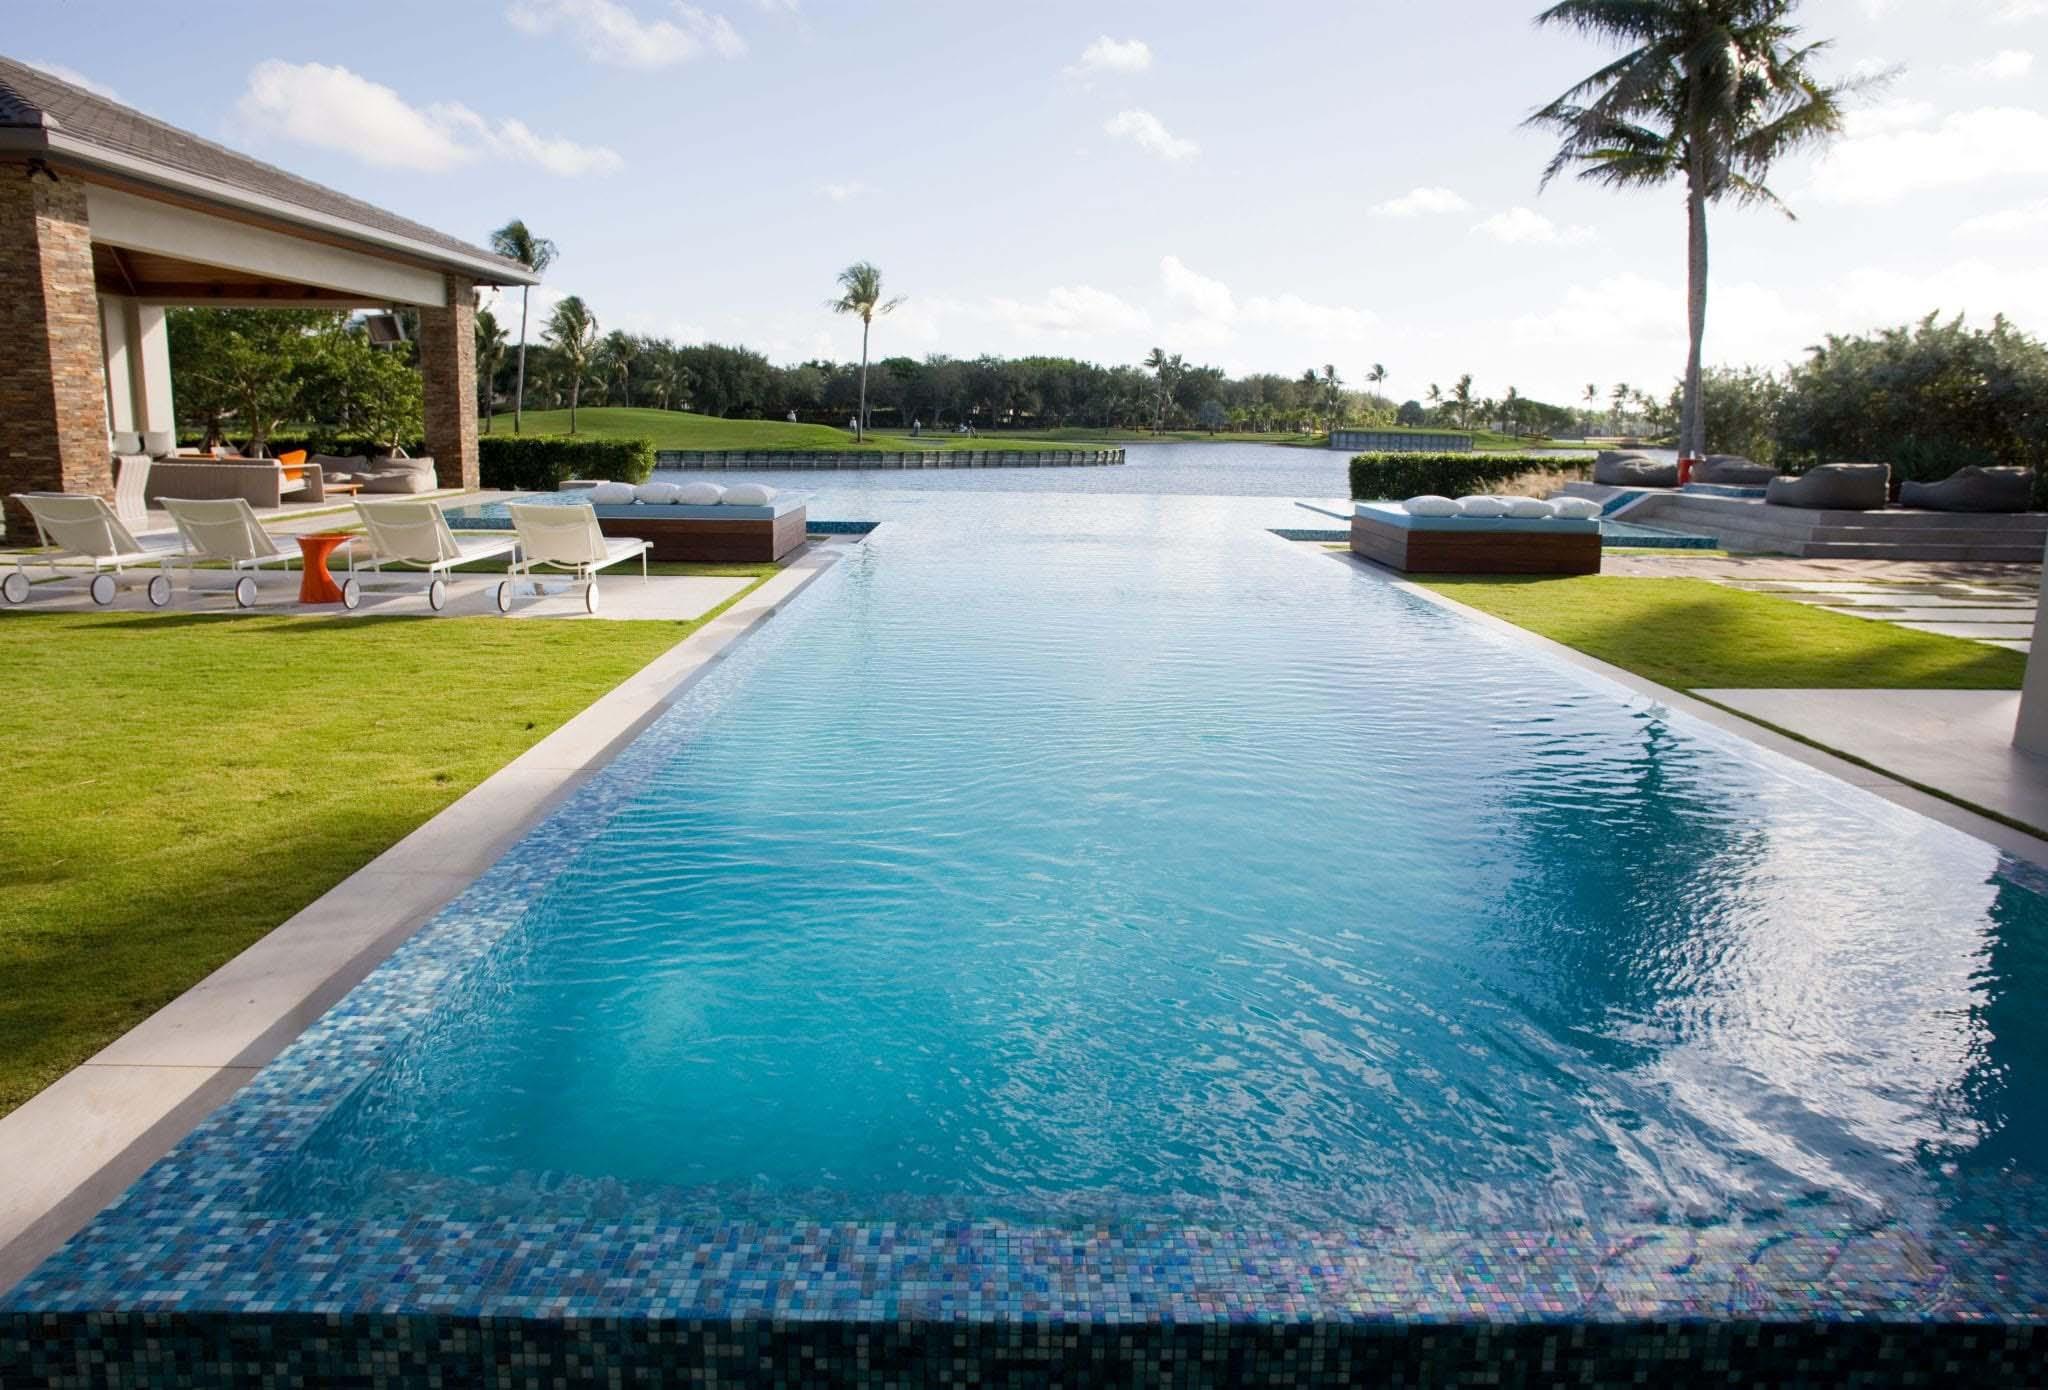 Private Pool in Boca Raton, Florida